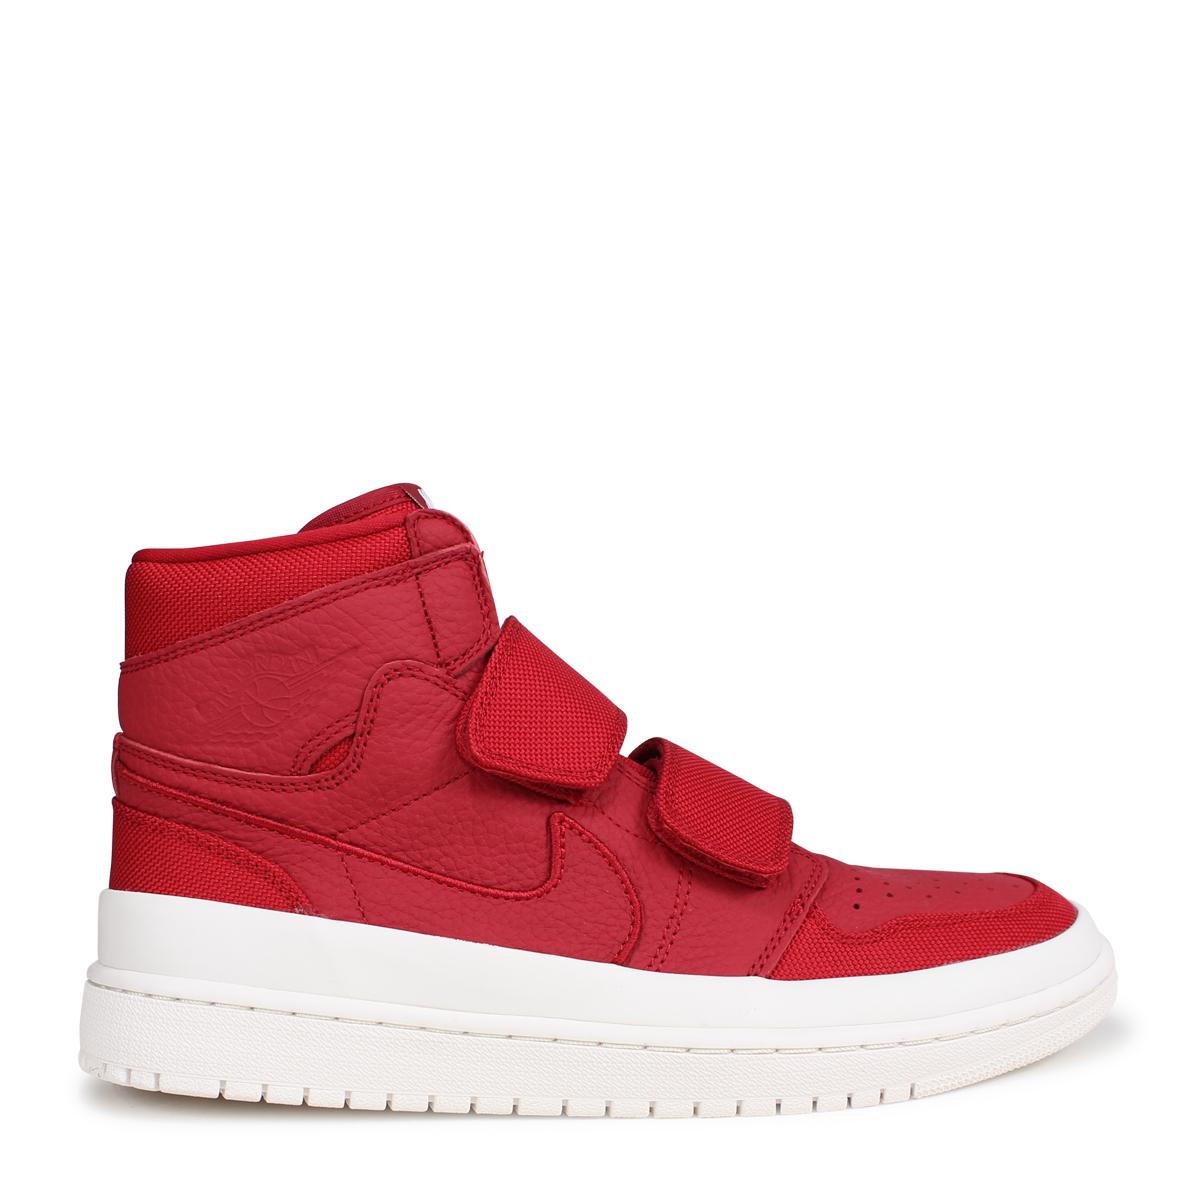 NIKE AIR JORDAN 1 RETRO HI DOUBLE STRAP Nike Air Jordan 1 nostalgic high  sneakers men AQ7924-601 red  load planned Shinnyu load in reservation  product 9 25 ... 2a1d9d0b1